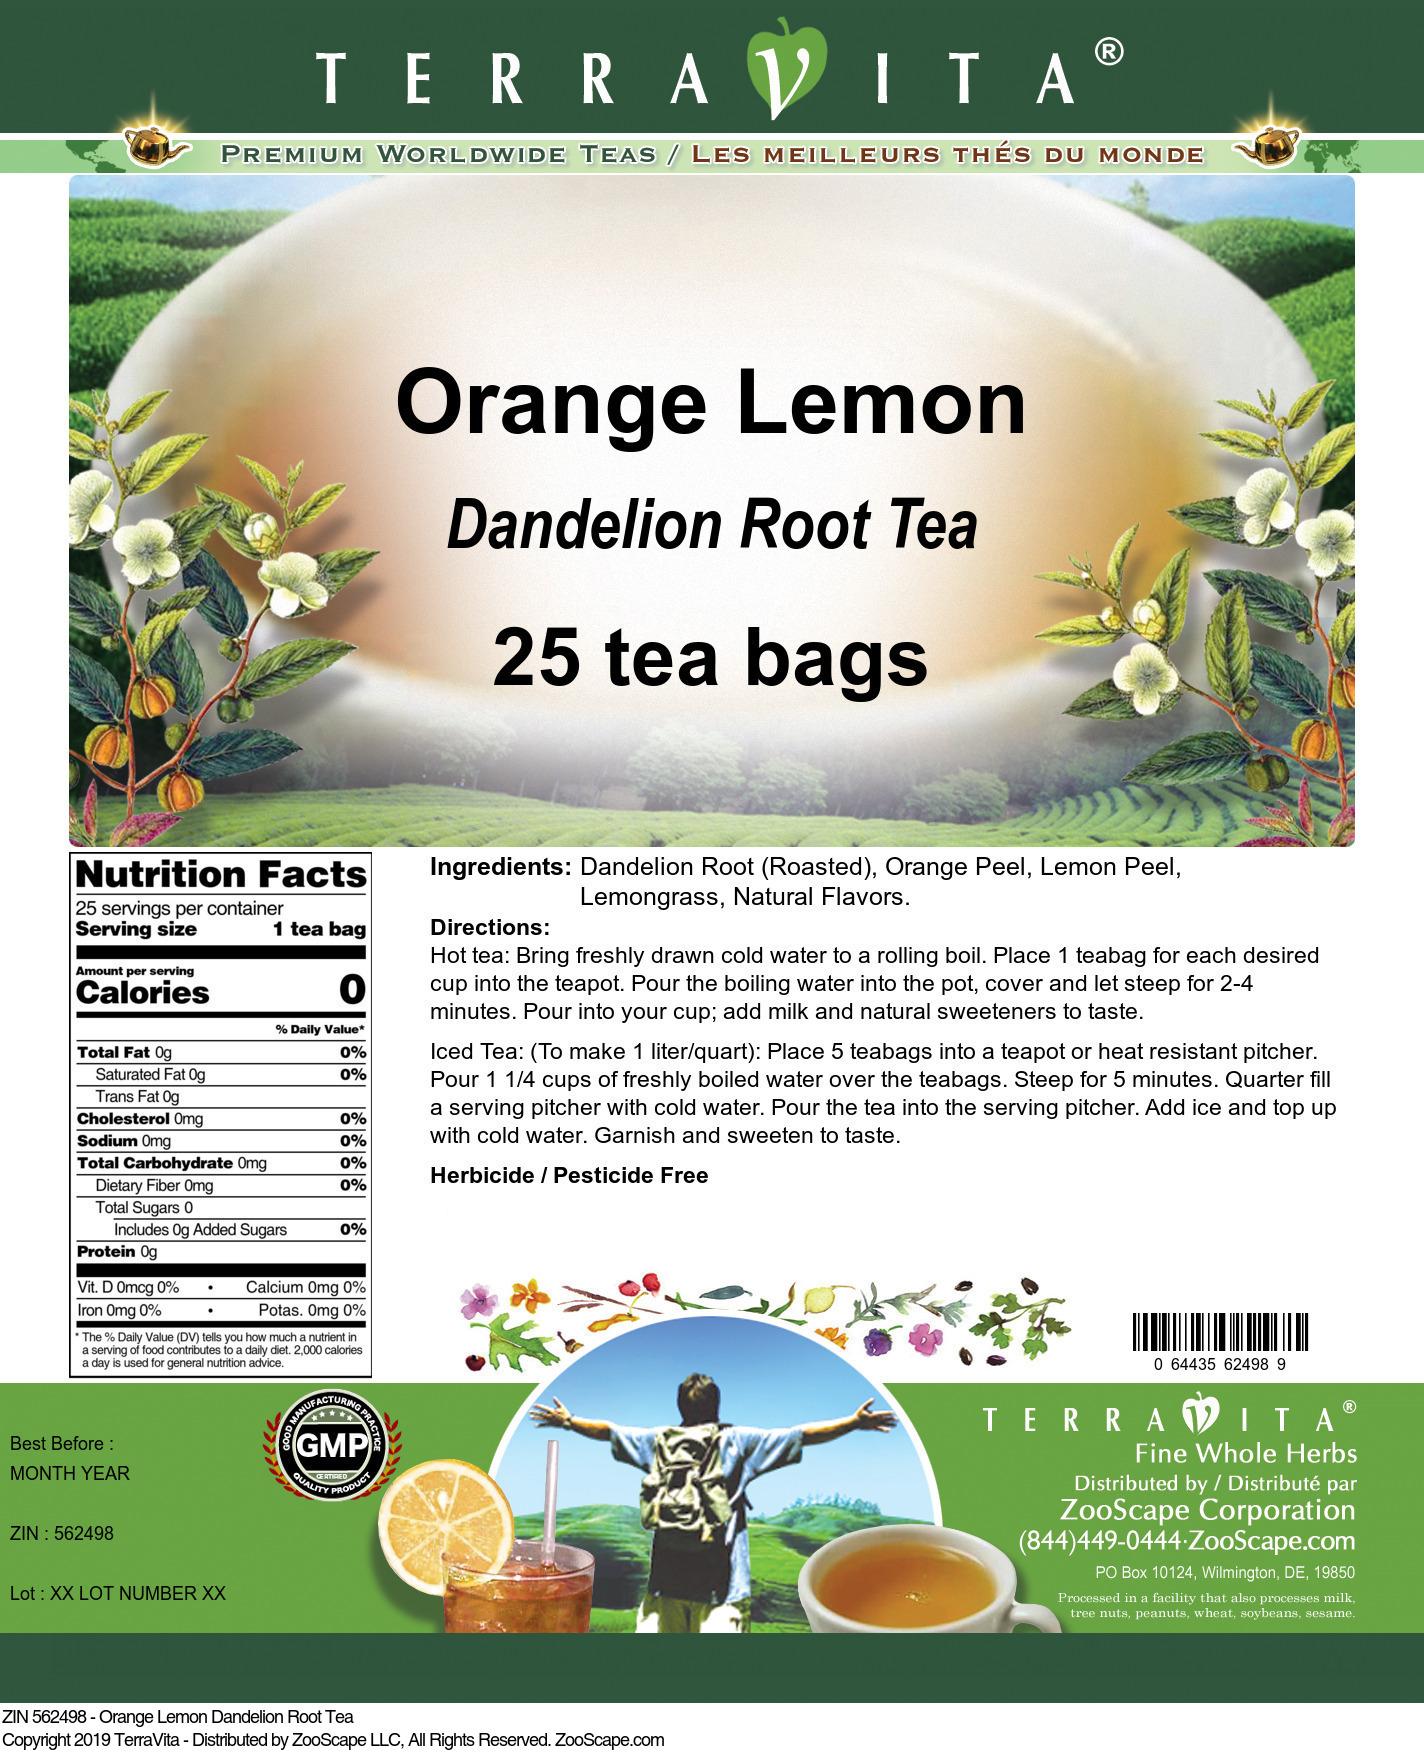 Orange Lemon Dandelion Root